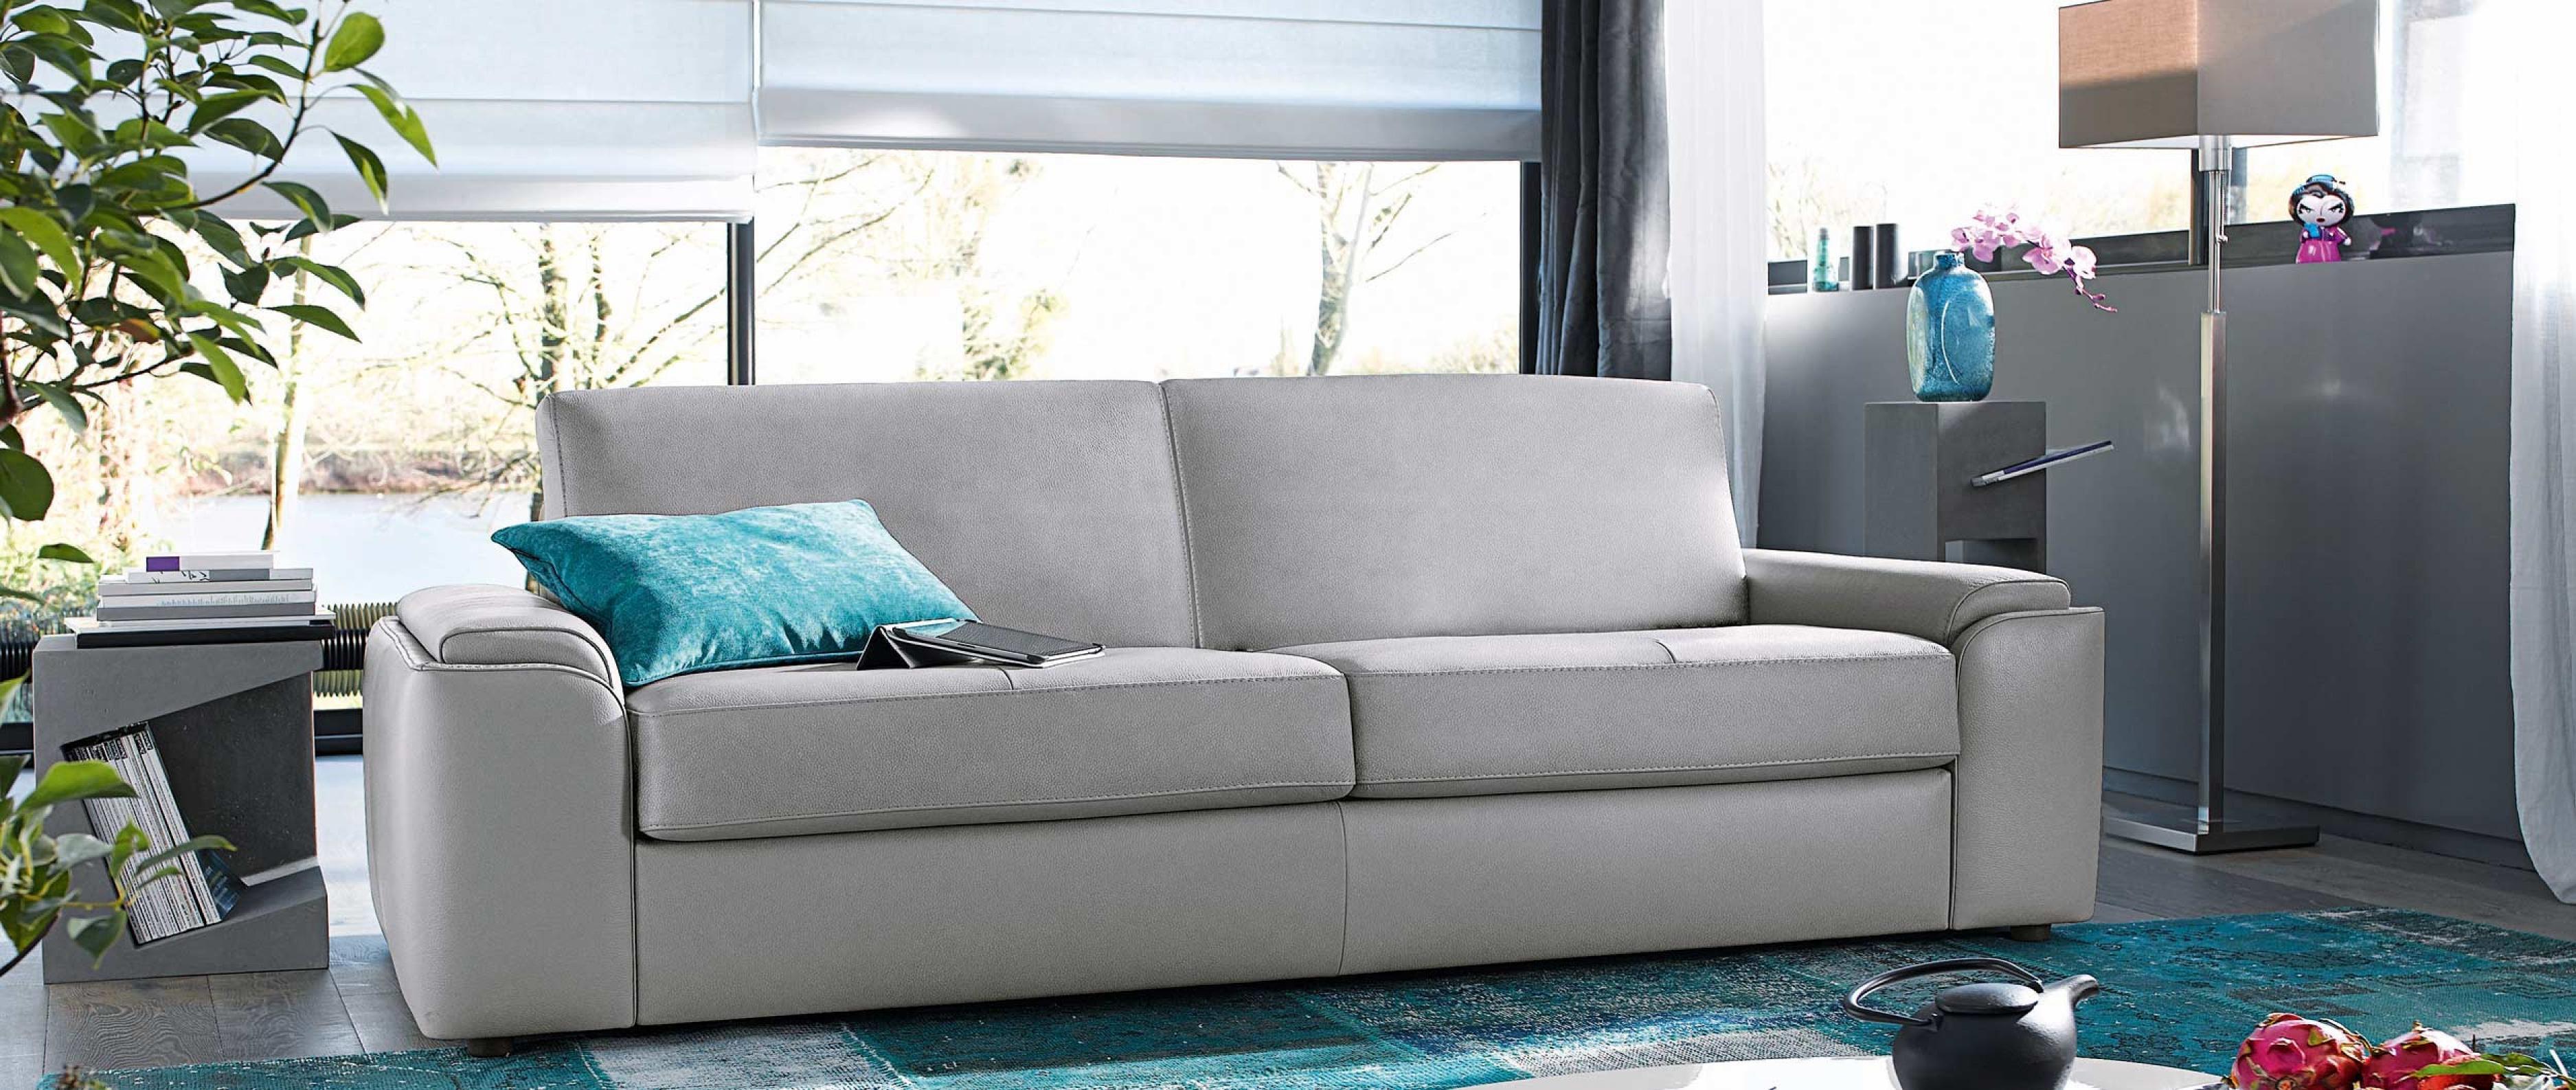 Canapé convertible 2 places cuir center Royal Sofa idée de